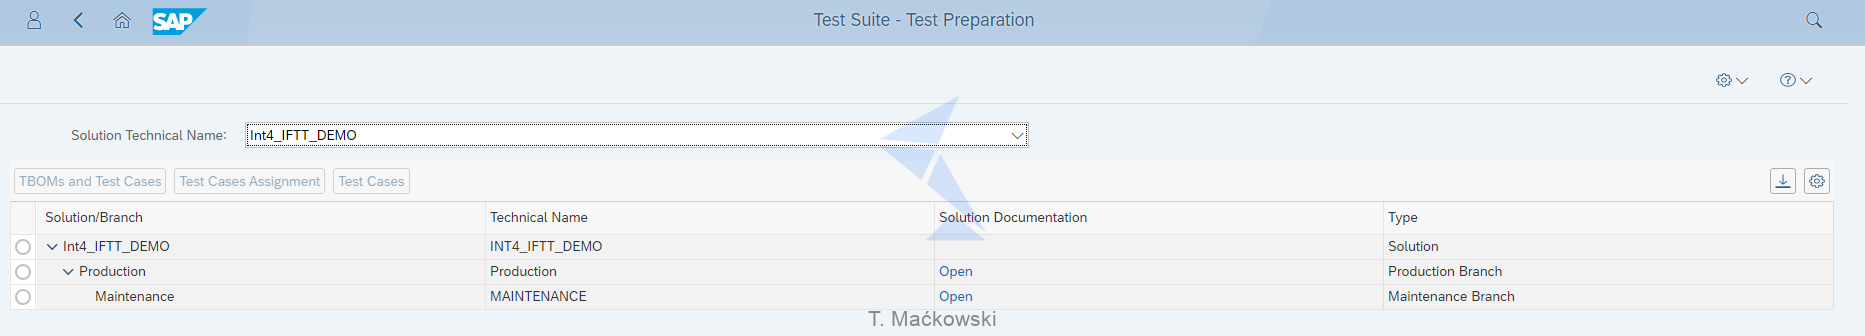 test_preparation_solution